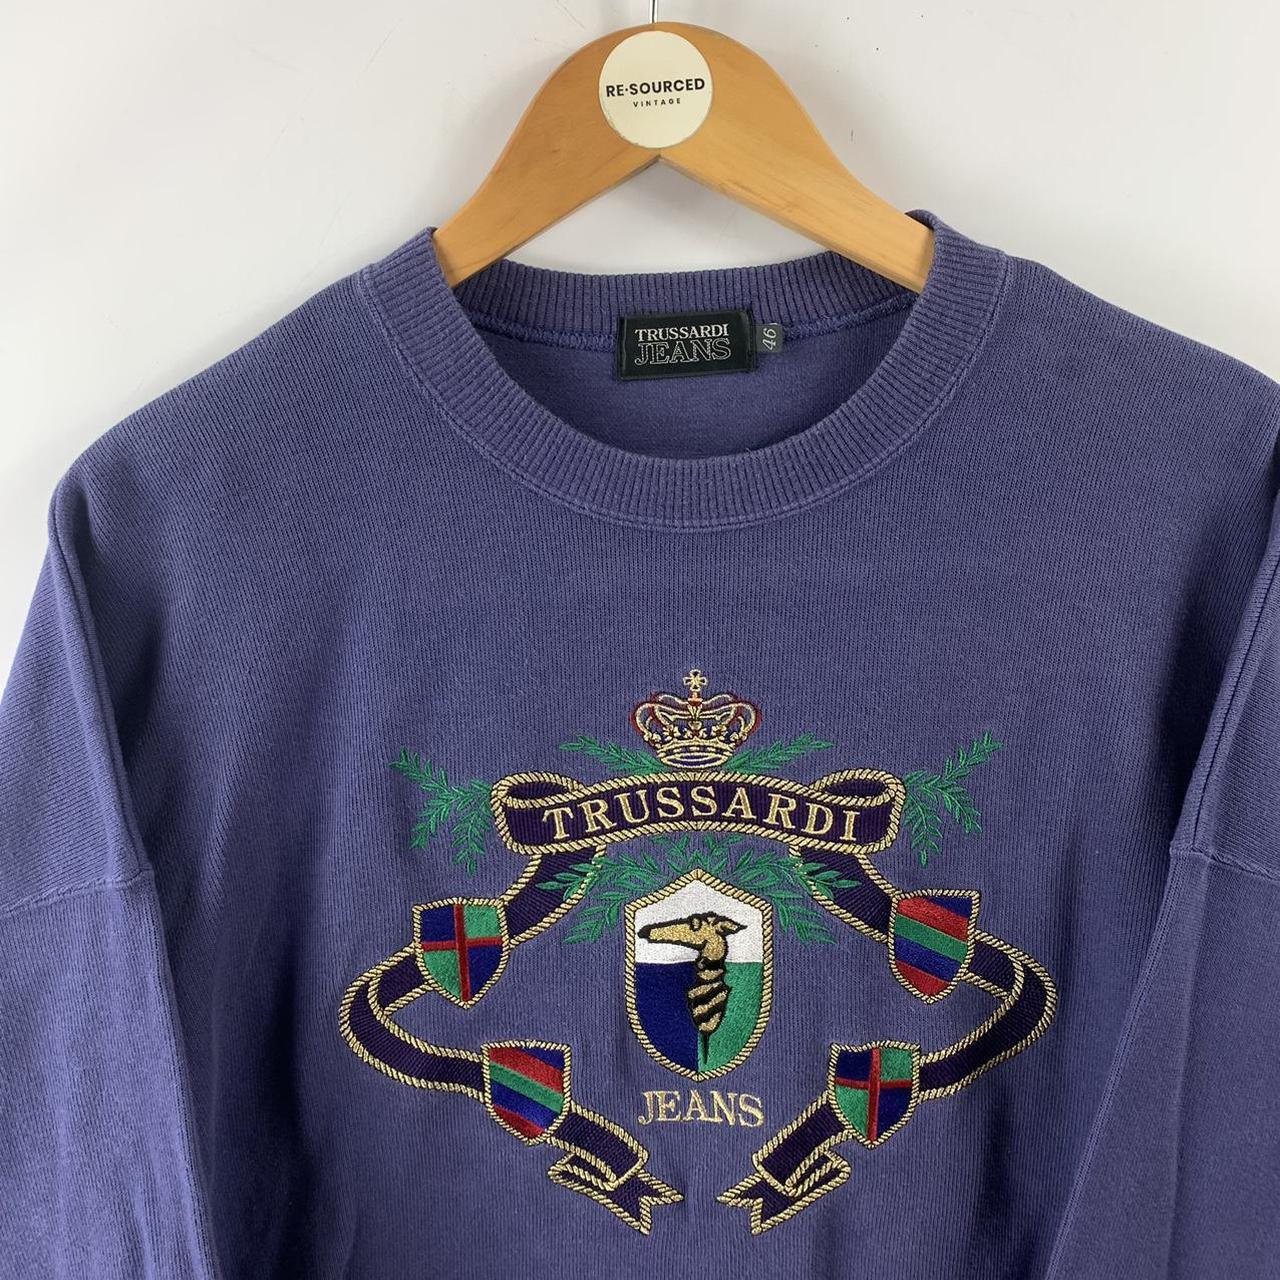 Product Image 1 - Vintage Trussardi crewneck jumper with